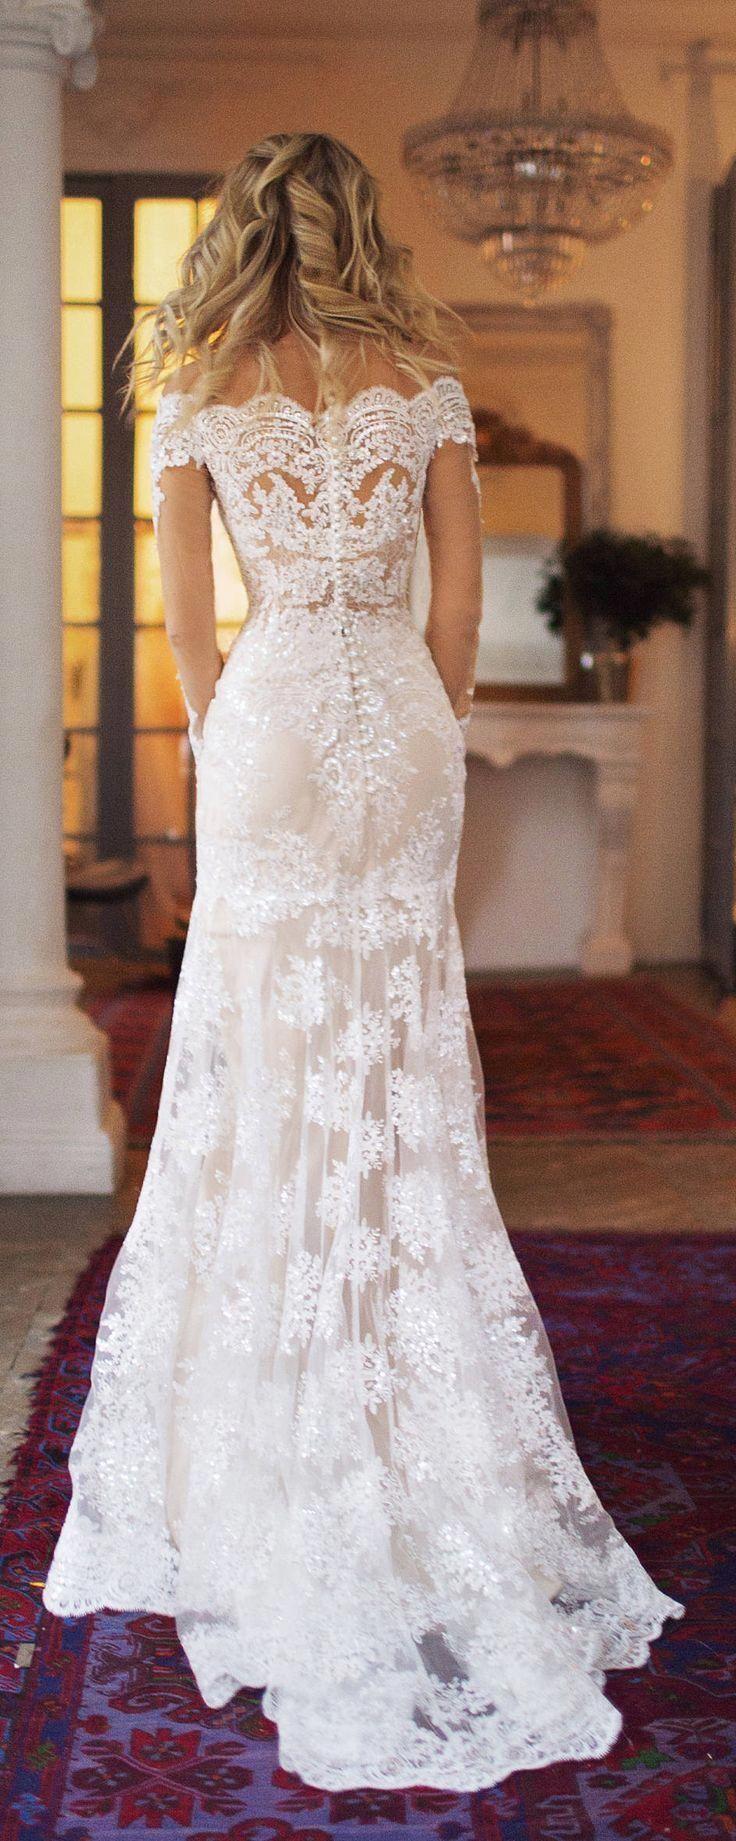 weddinginspiration Detachable train wedding dress